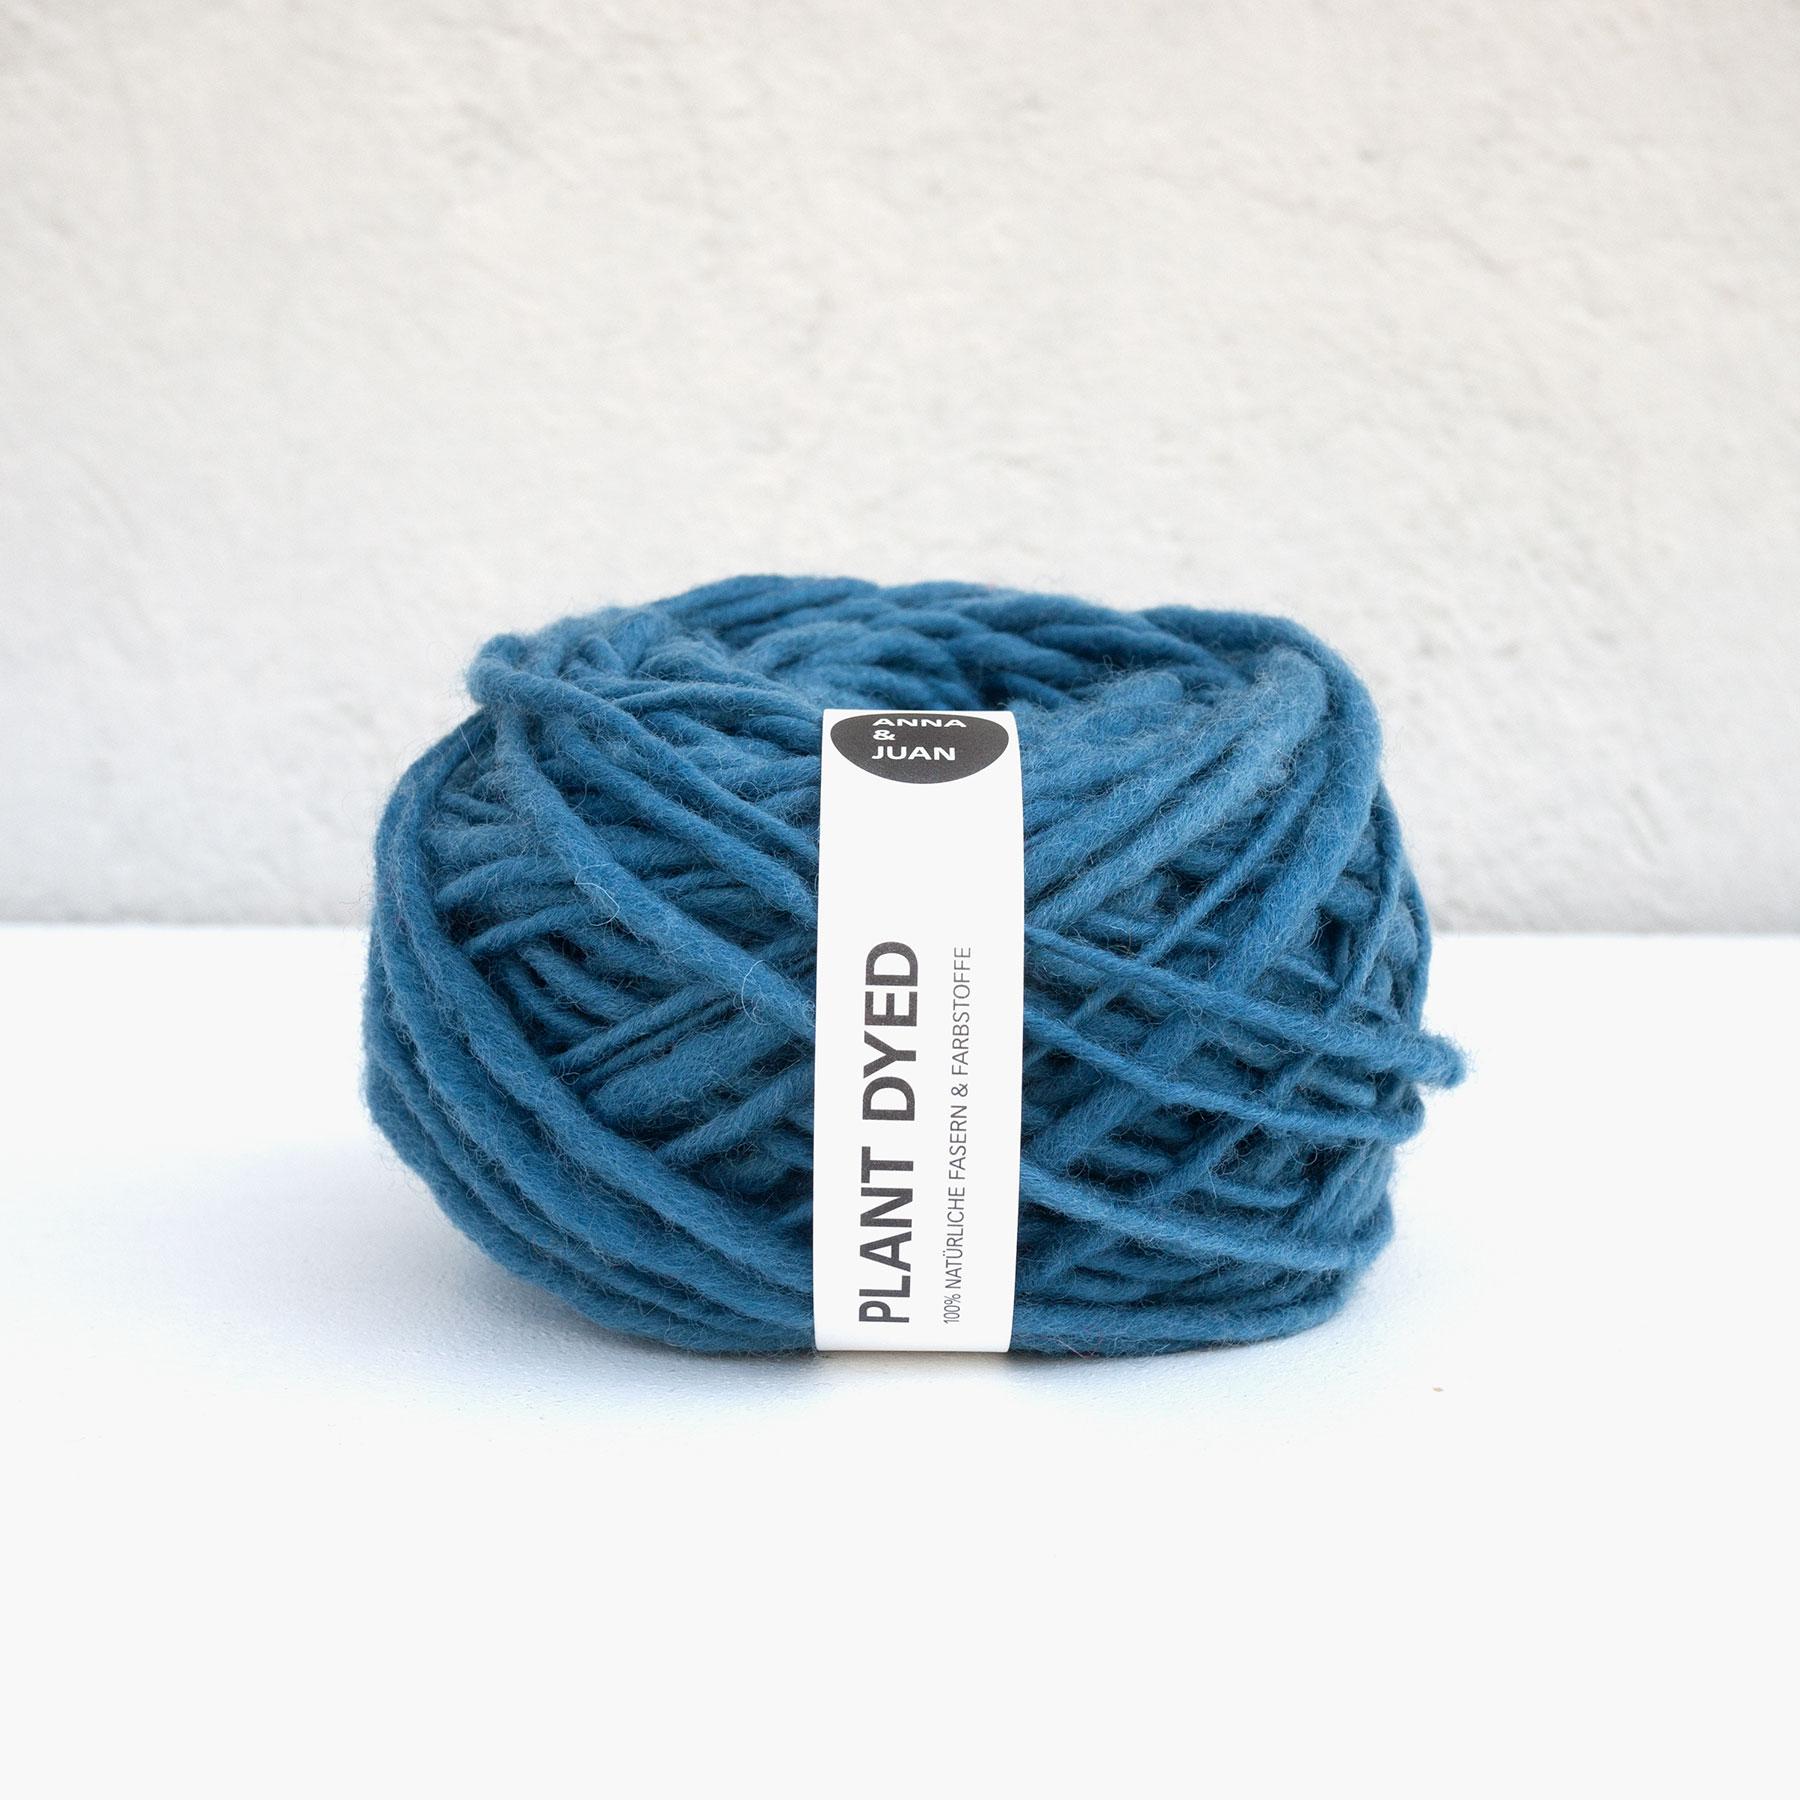 Anna & Juan Wolle «Plant Dyed» – Merino Handgesponnen – Super Bulky – Blau